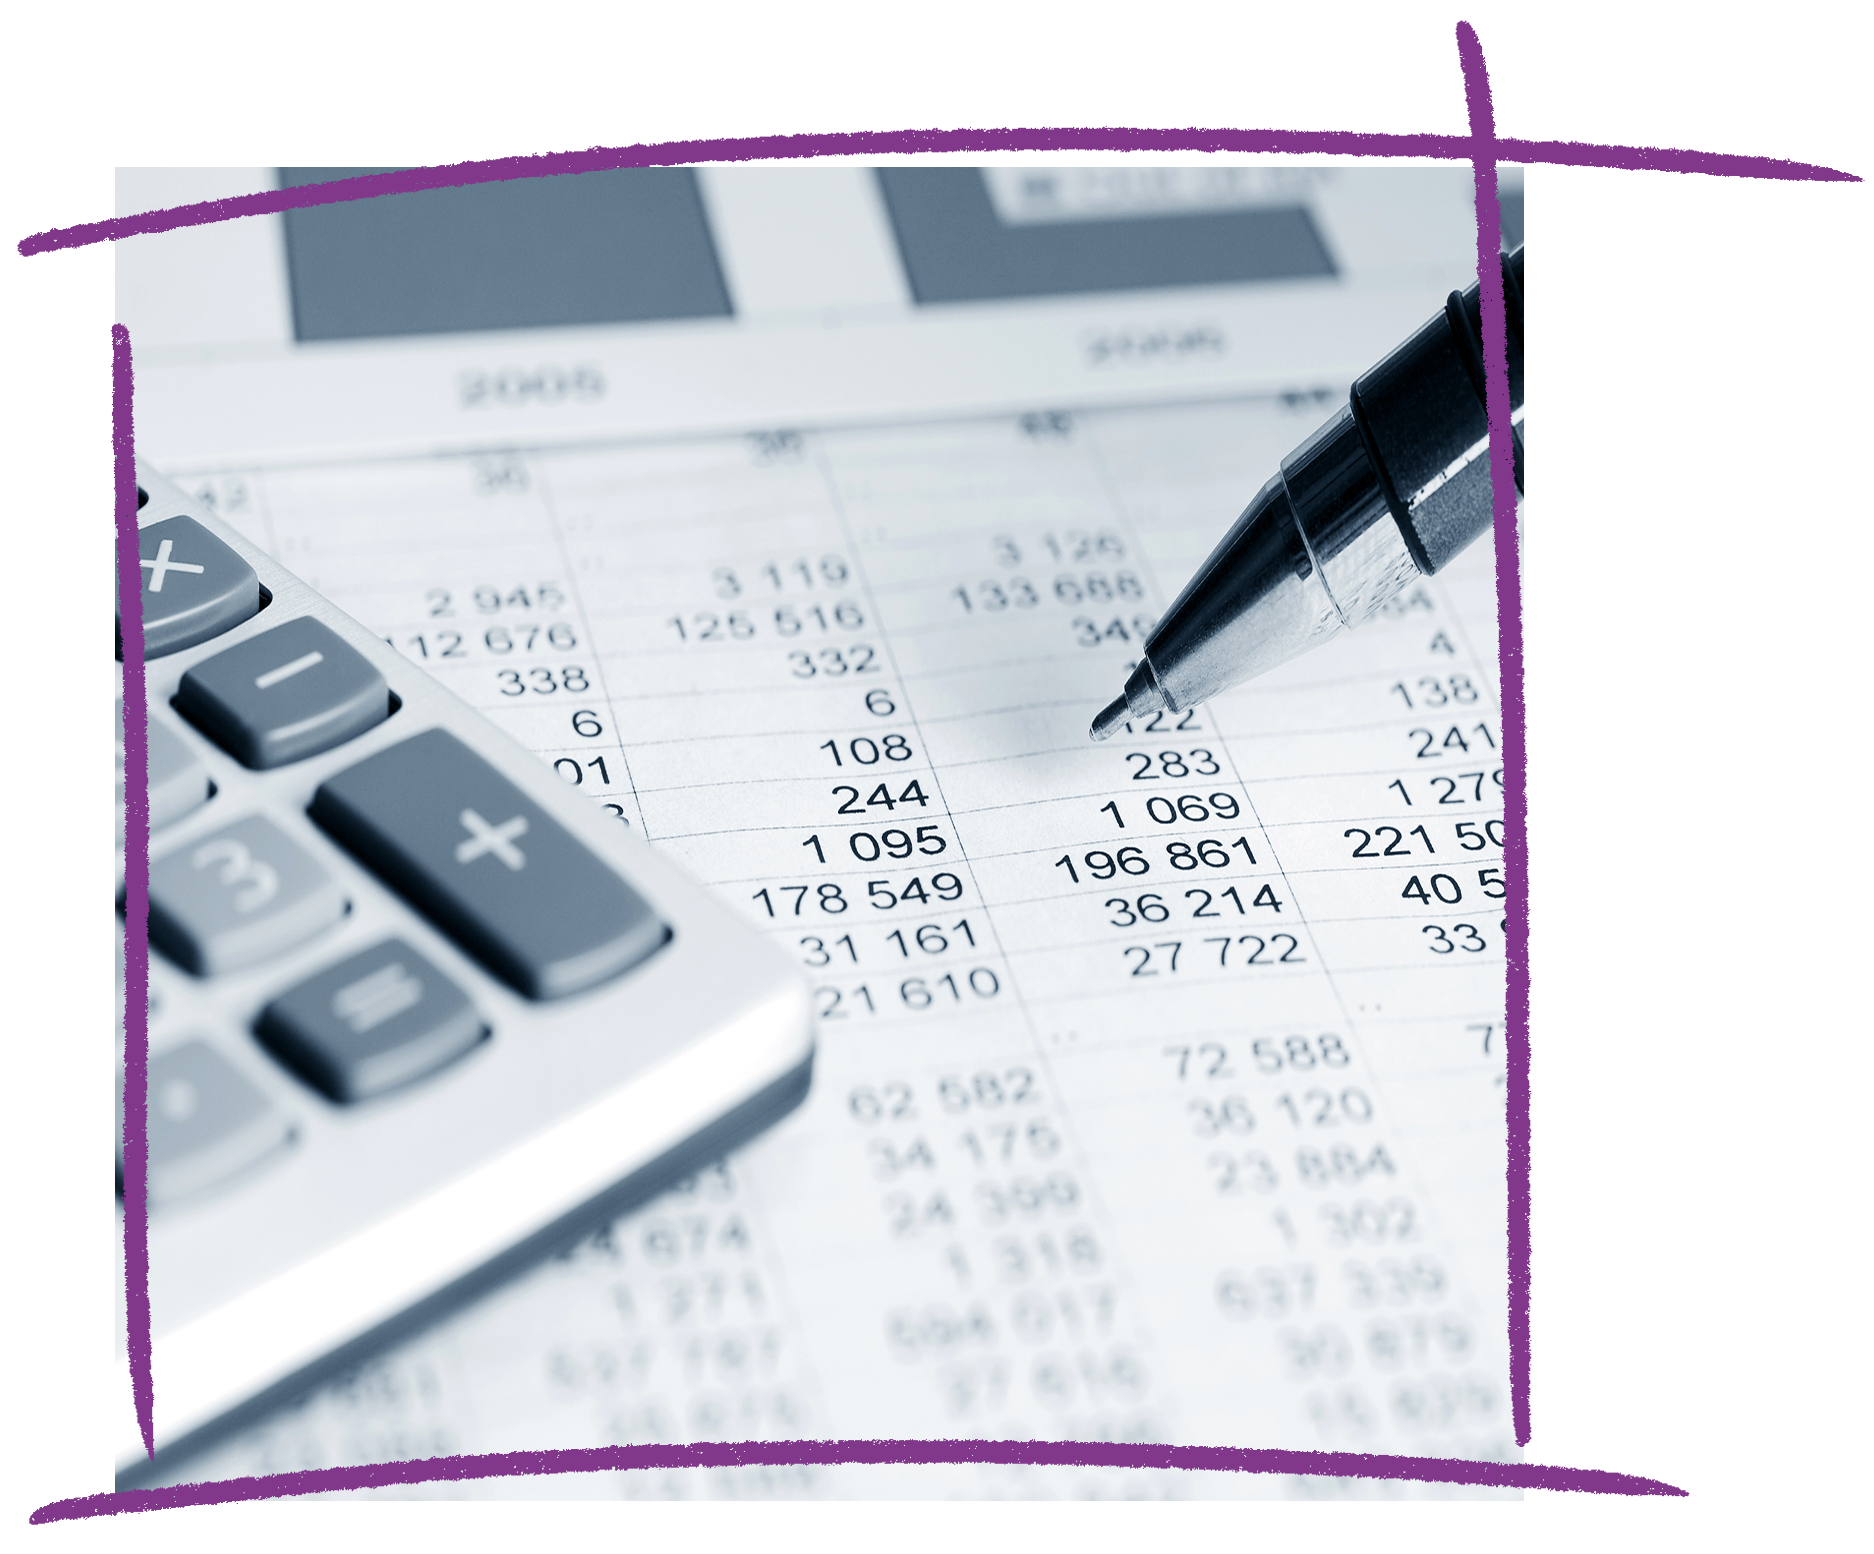 Photo of a pen, spreadsheet and calculator